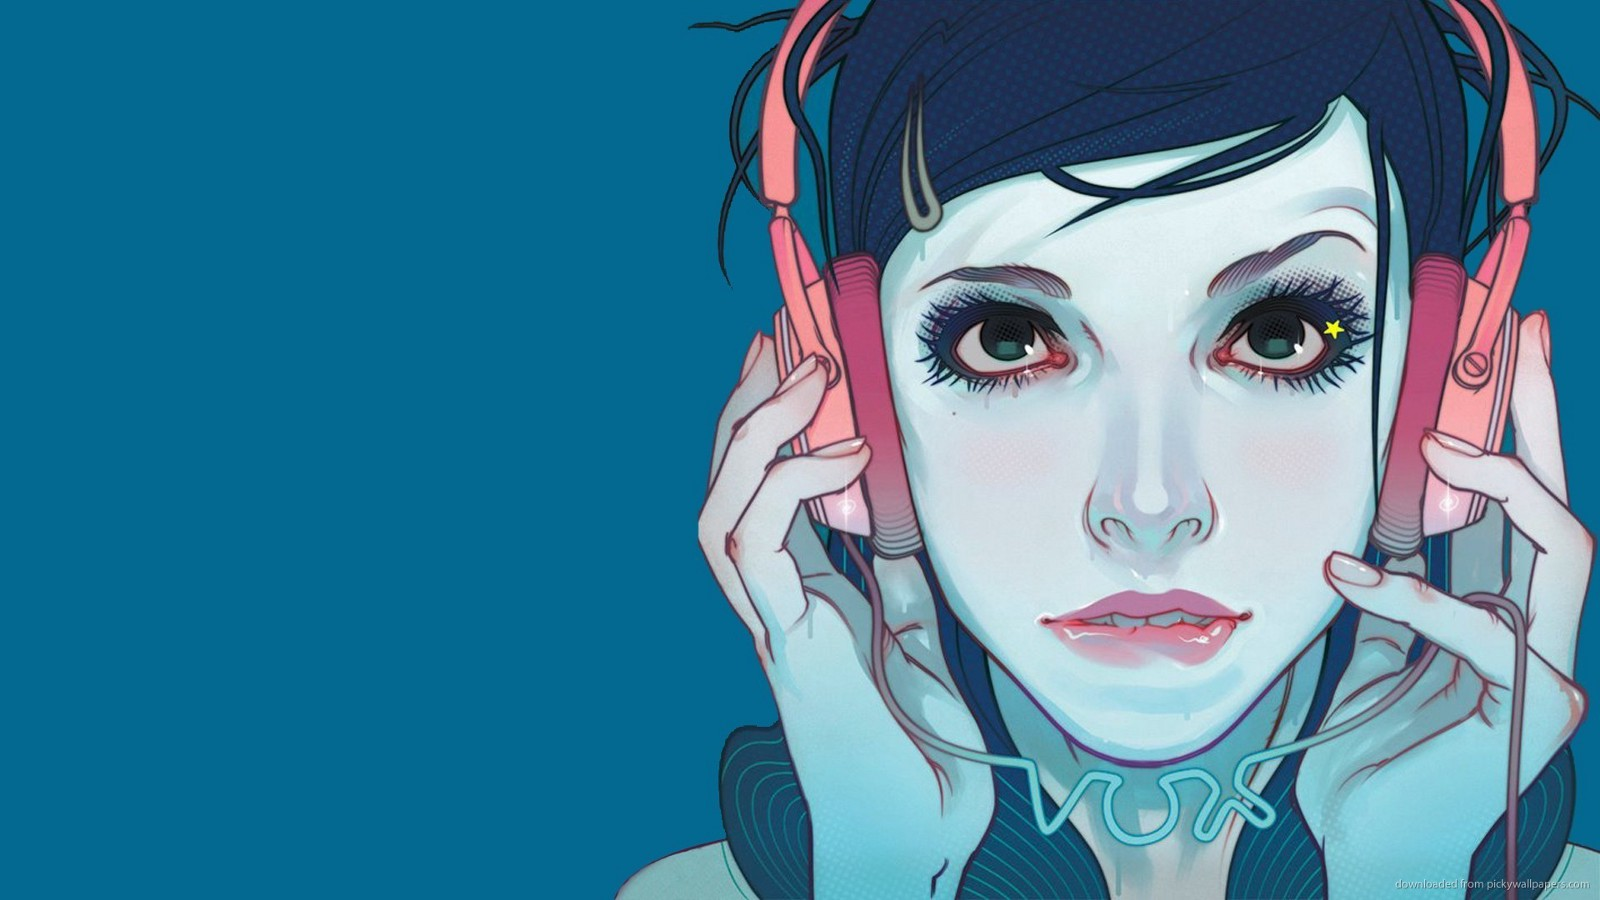 Girl Listening To Headphones Wallpaper Como Escuchar M 250 Sica Con Mejor Calidad En Youtube Master